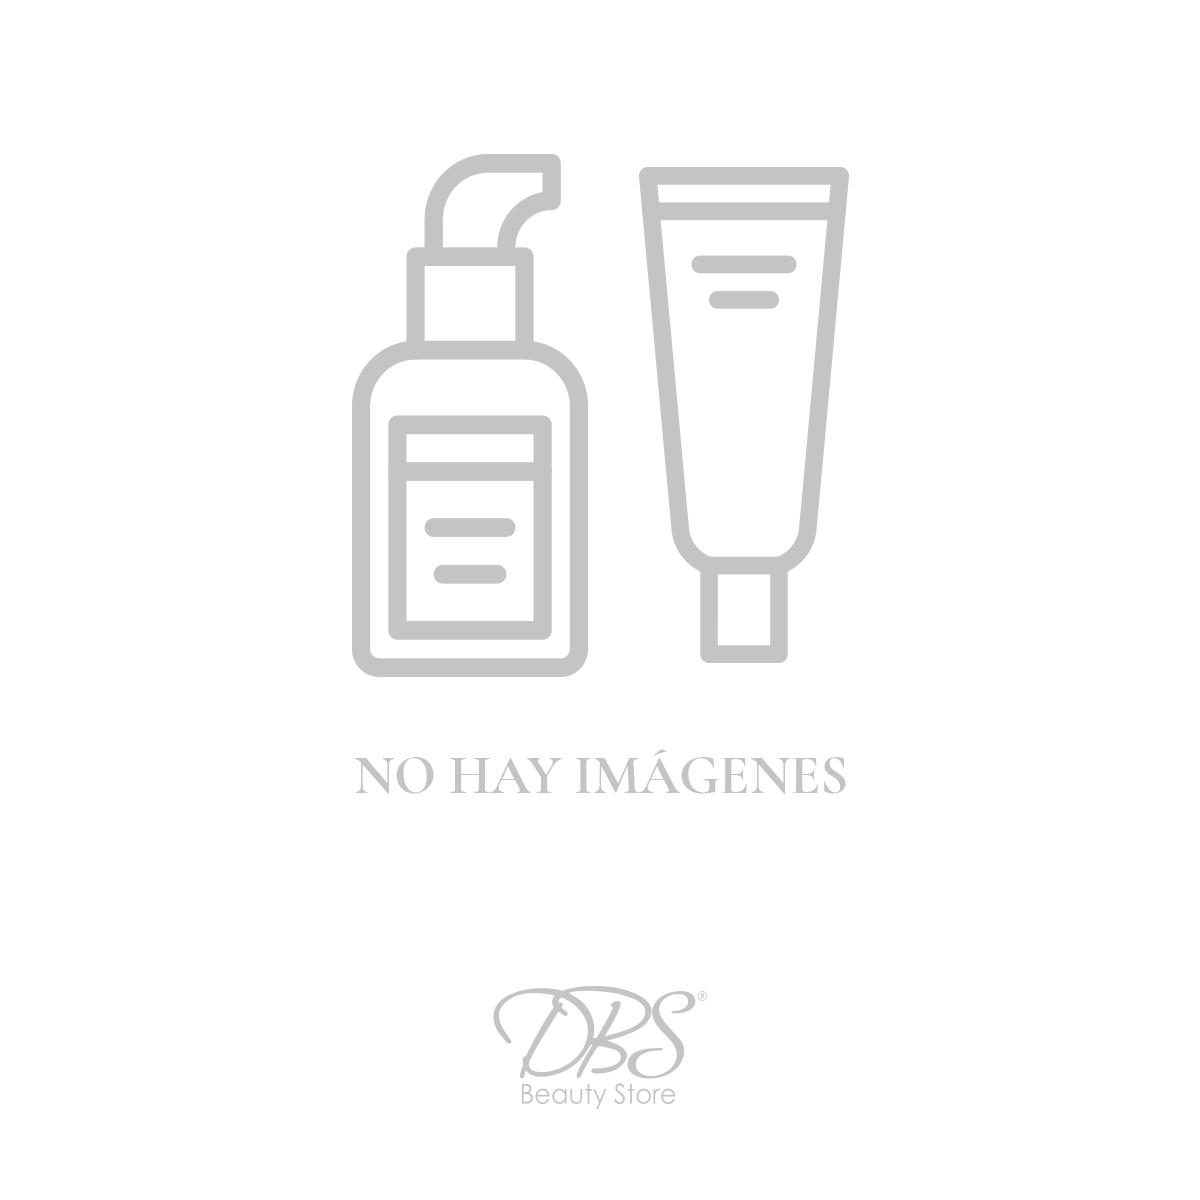 beauty-box-DBS-CO0163-MP.jpg